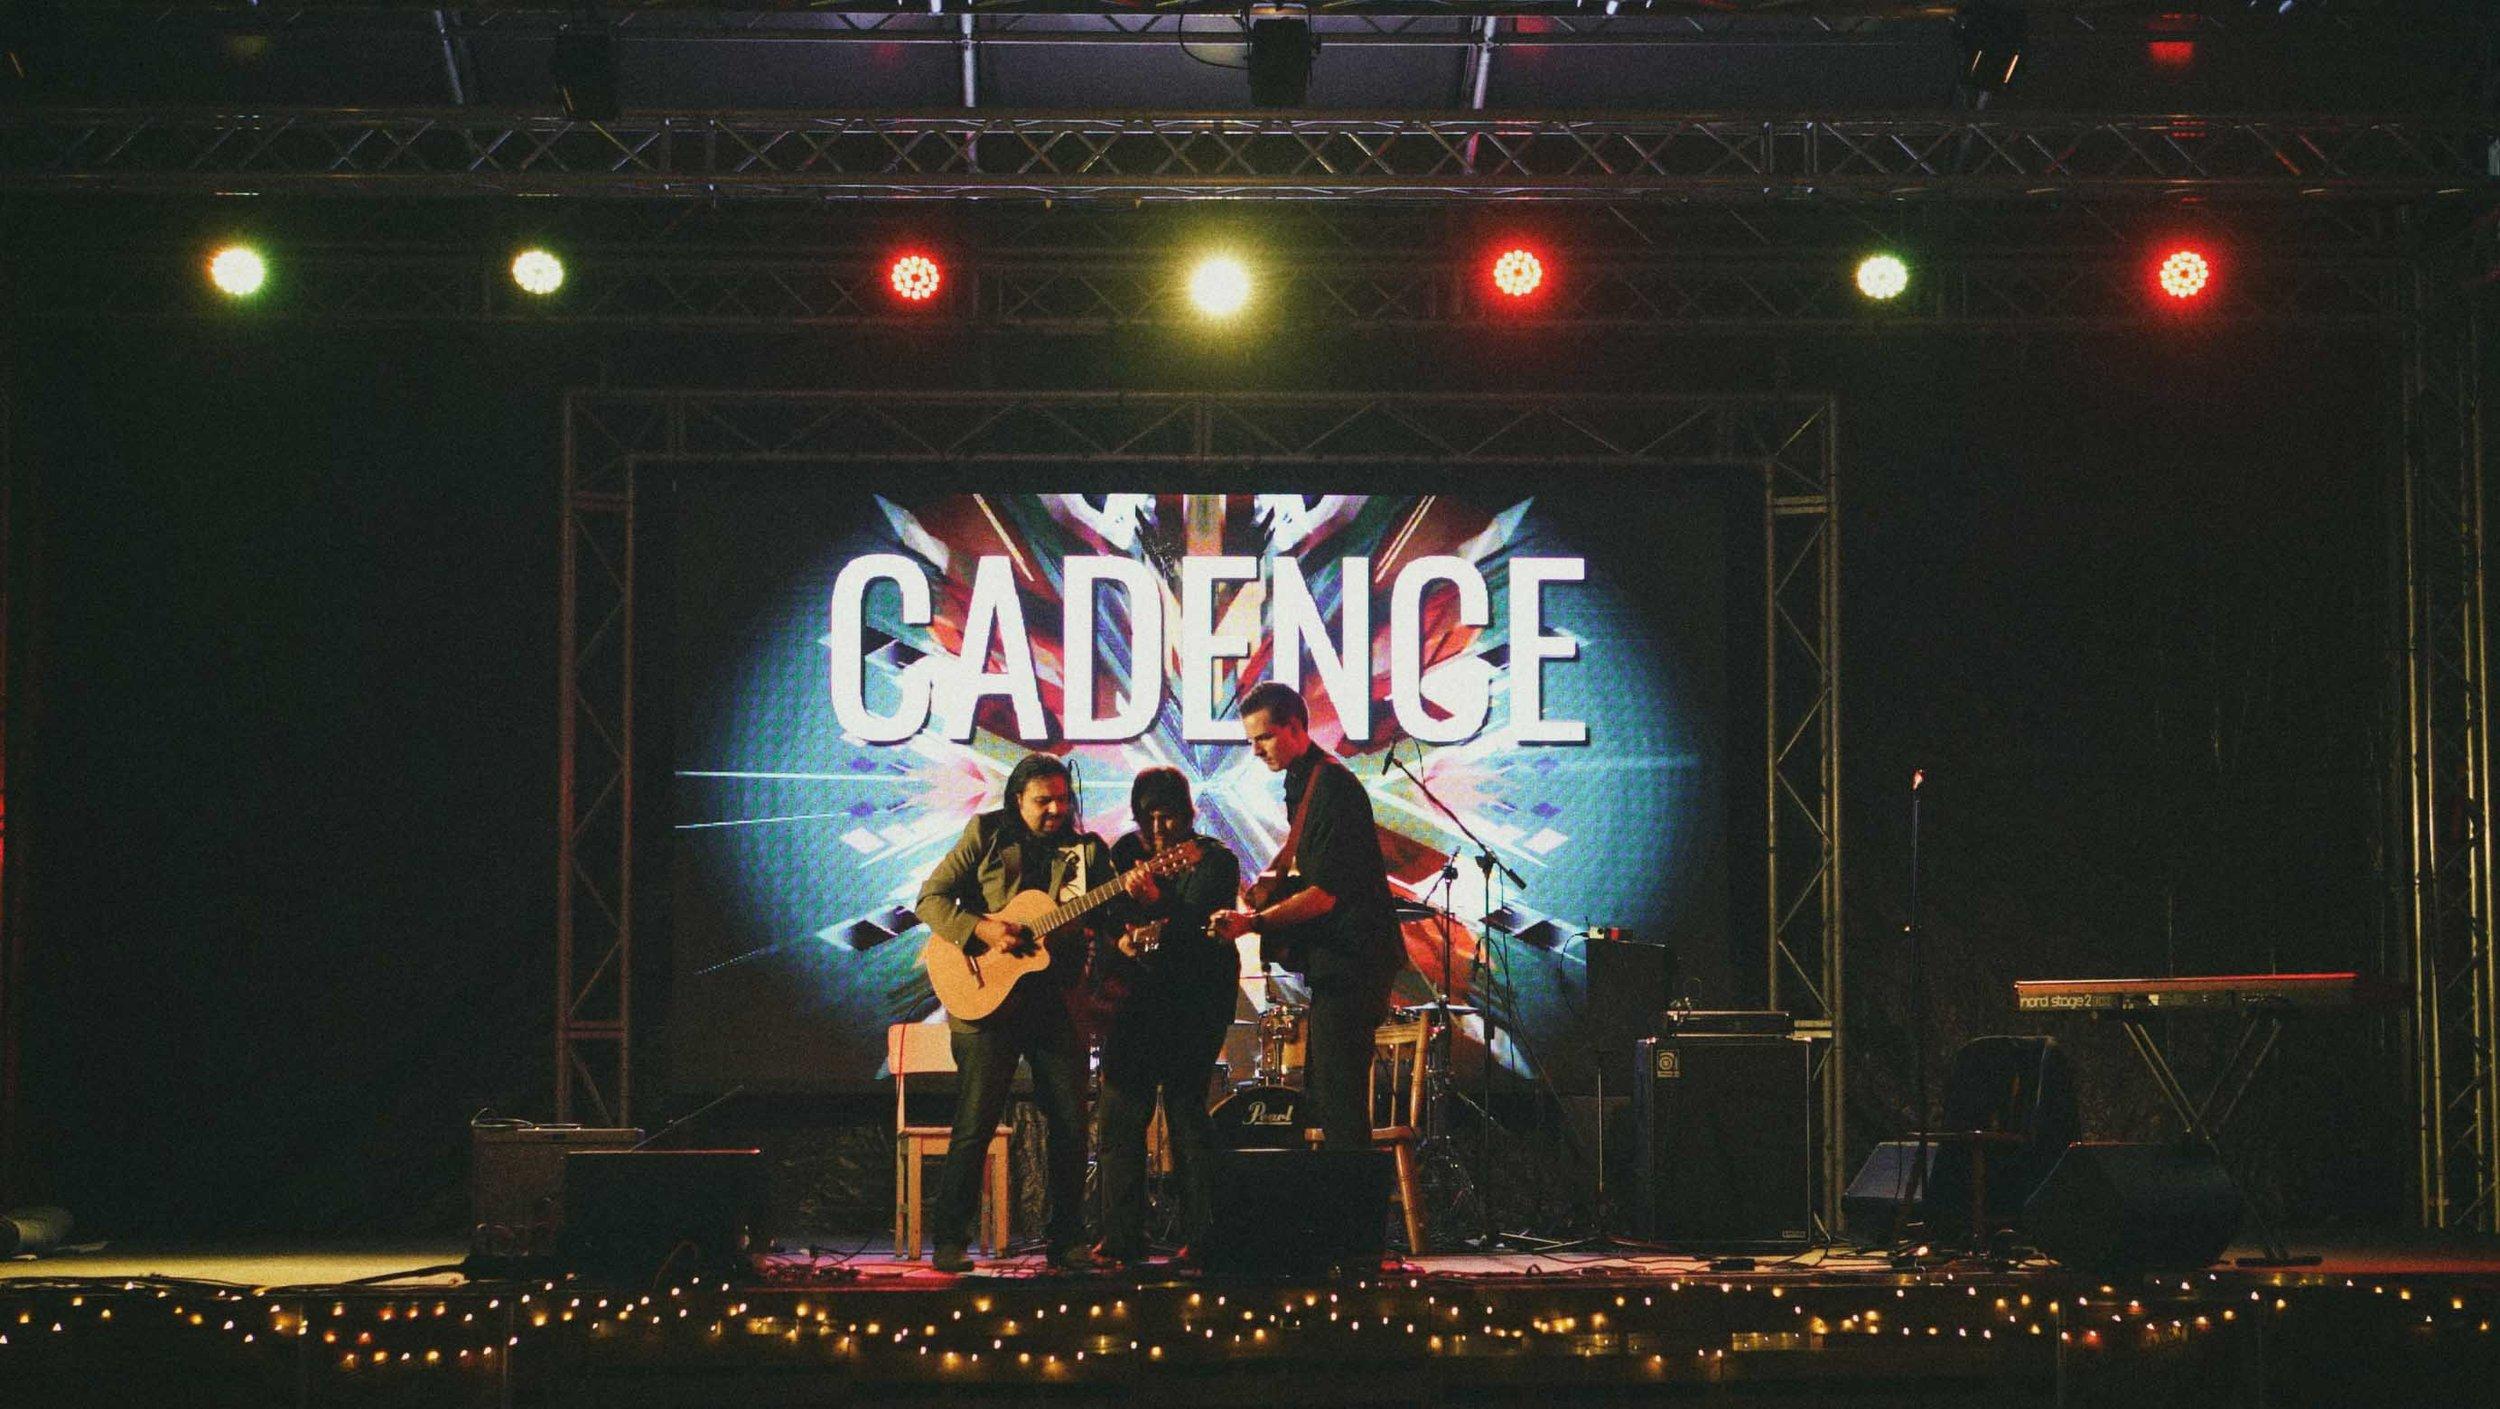 Cadence - NightQuarter - June 2017